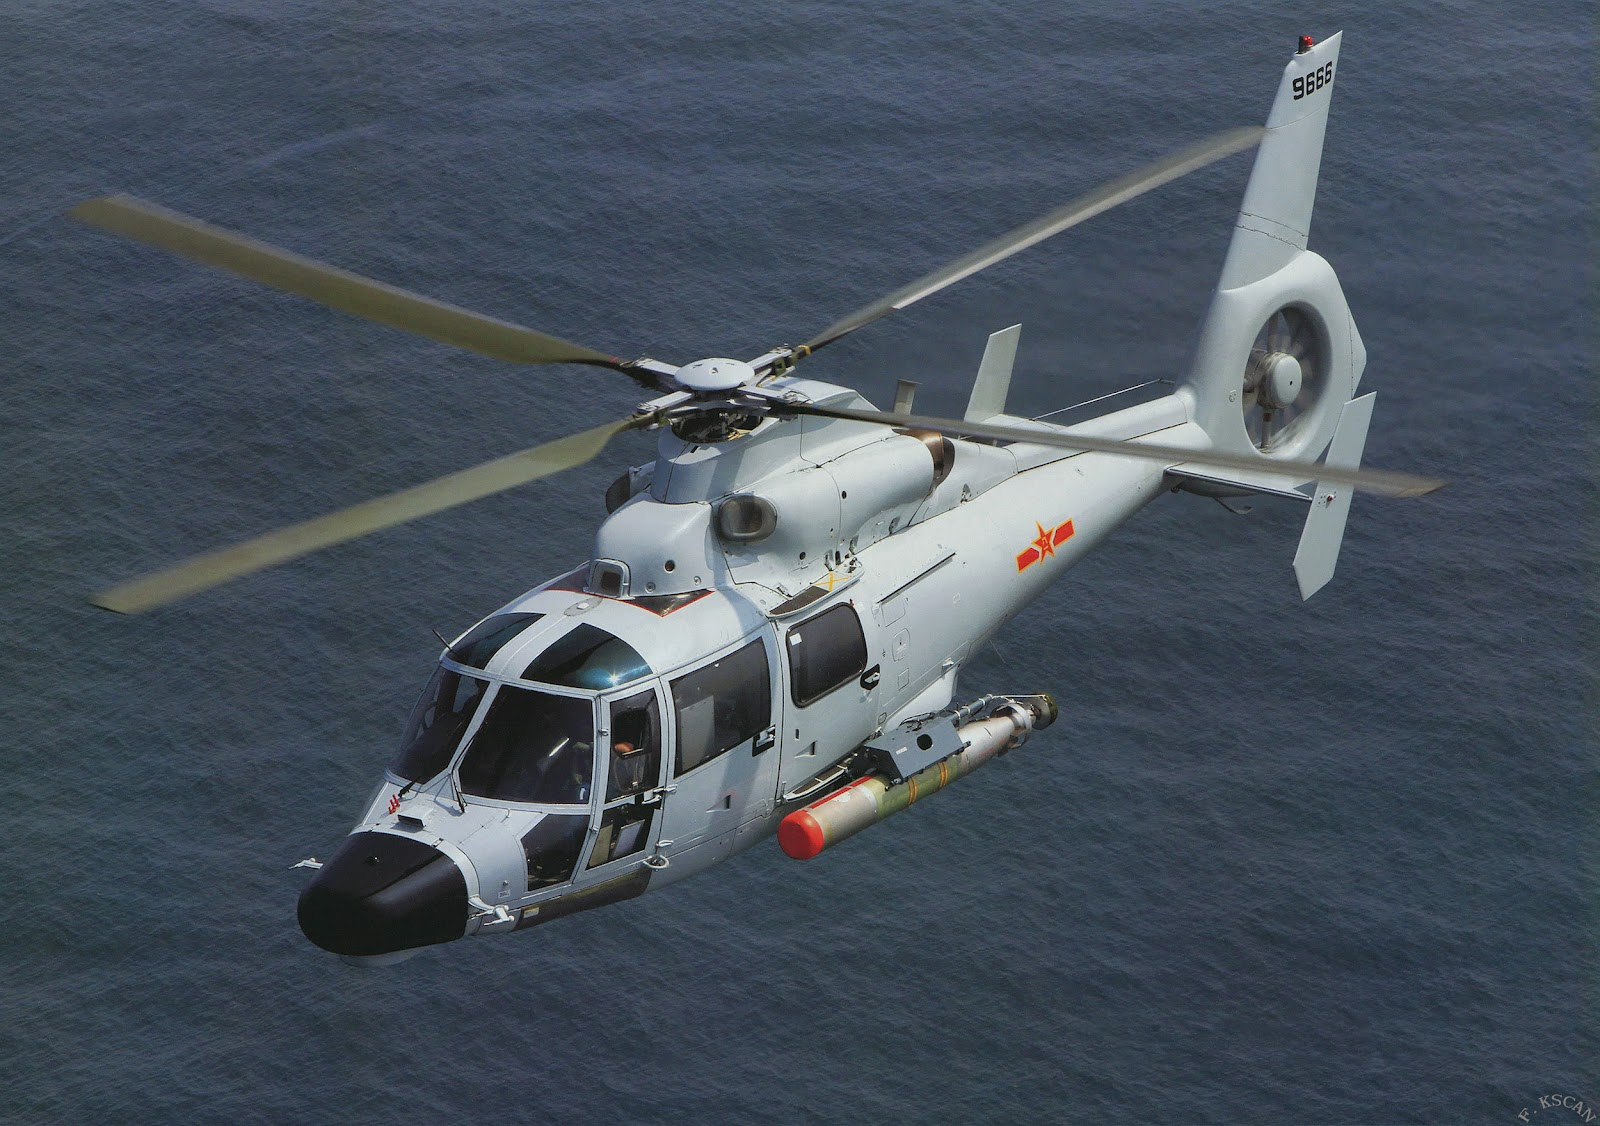 ال H-6 فى حلتها الجديدة (H-6K) Harbin+helicopter.+Z-9EC+ASW+Naval+Air+Arm+pulse-compression+radar,+low+frequency+dipping+sonar,+radar+warning+receiver+and+doppler+navigation+system,+torpedoes+frigates+(3)